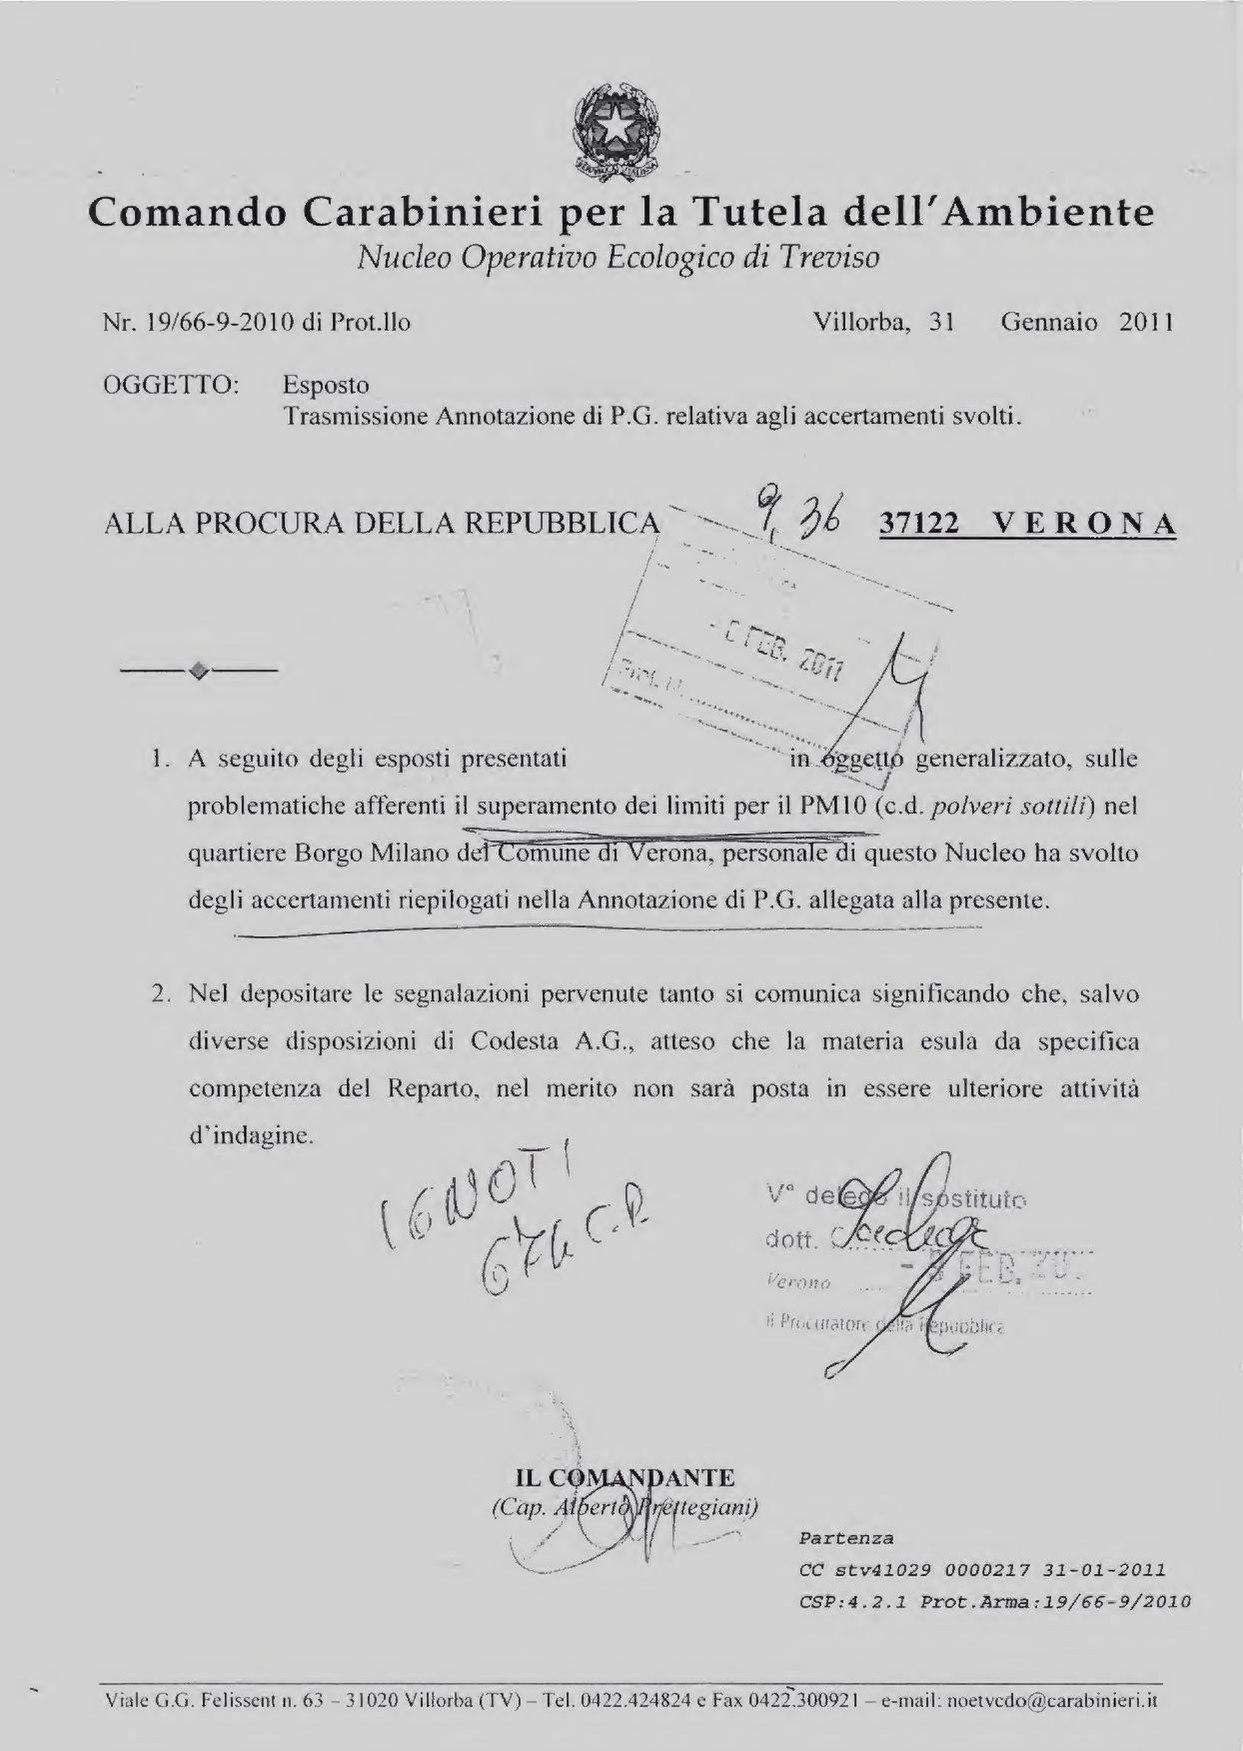 PM10 Tribunale Verona 795-11 ignoti PM SACHAR archiviato 4-5-2011.pdf